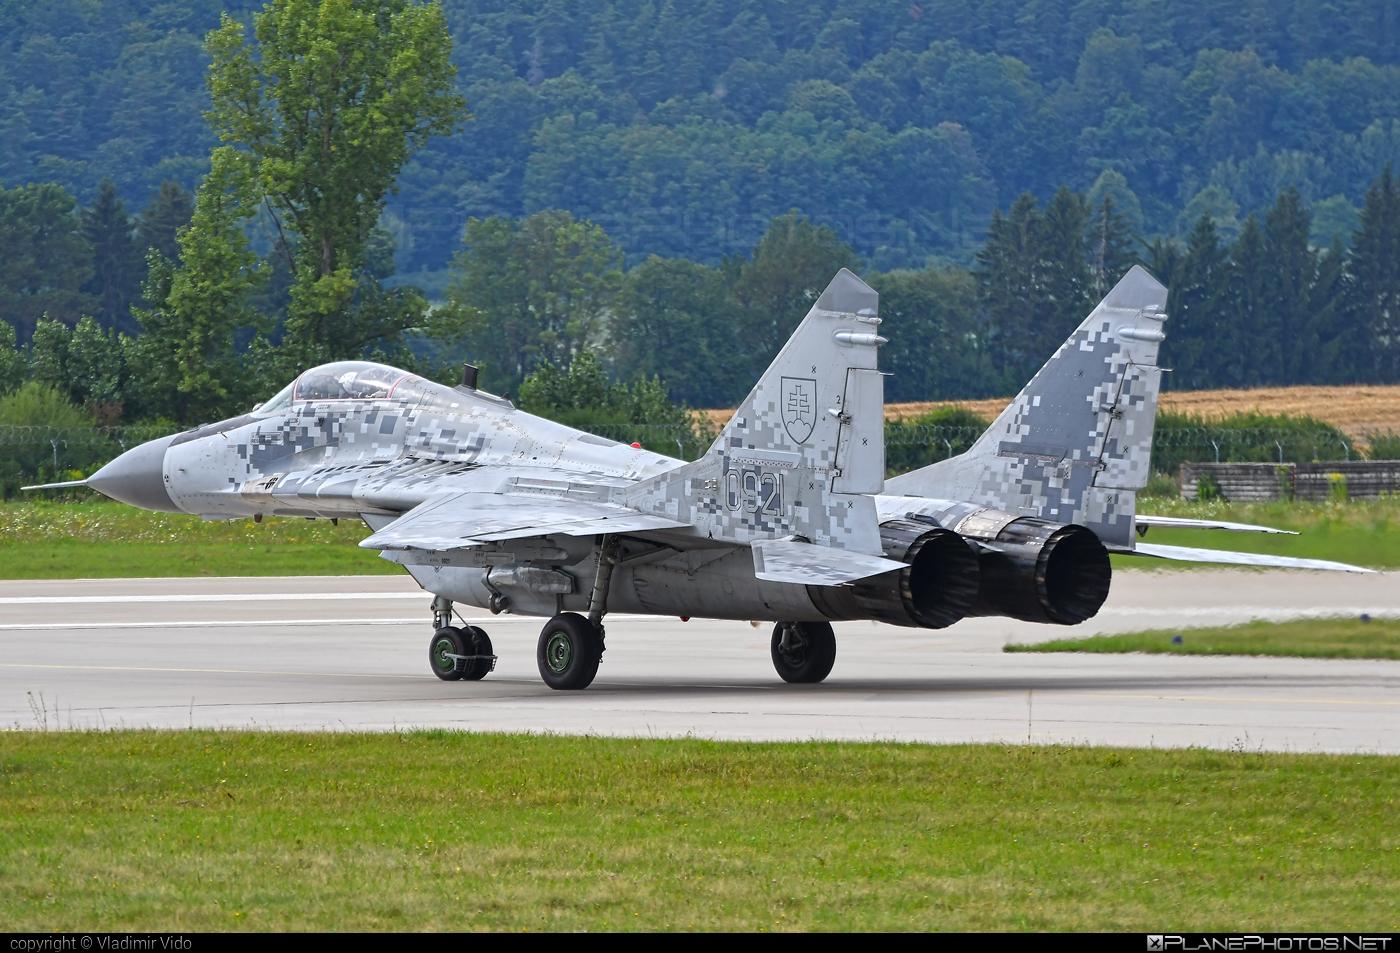 Mikoyan-Gurevich MiG-29AS - 0921 operated by Vzdušné sily OS SR (Slovak Air Force) #mig #mig29 #mig29as #mikoyangurevich #siaf2019 #slovakairforce #vzdusnesilyossr